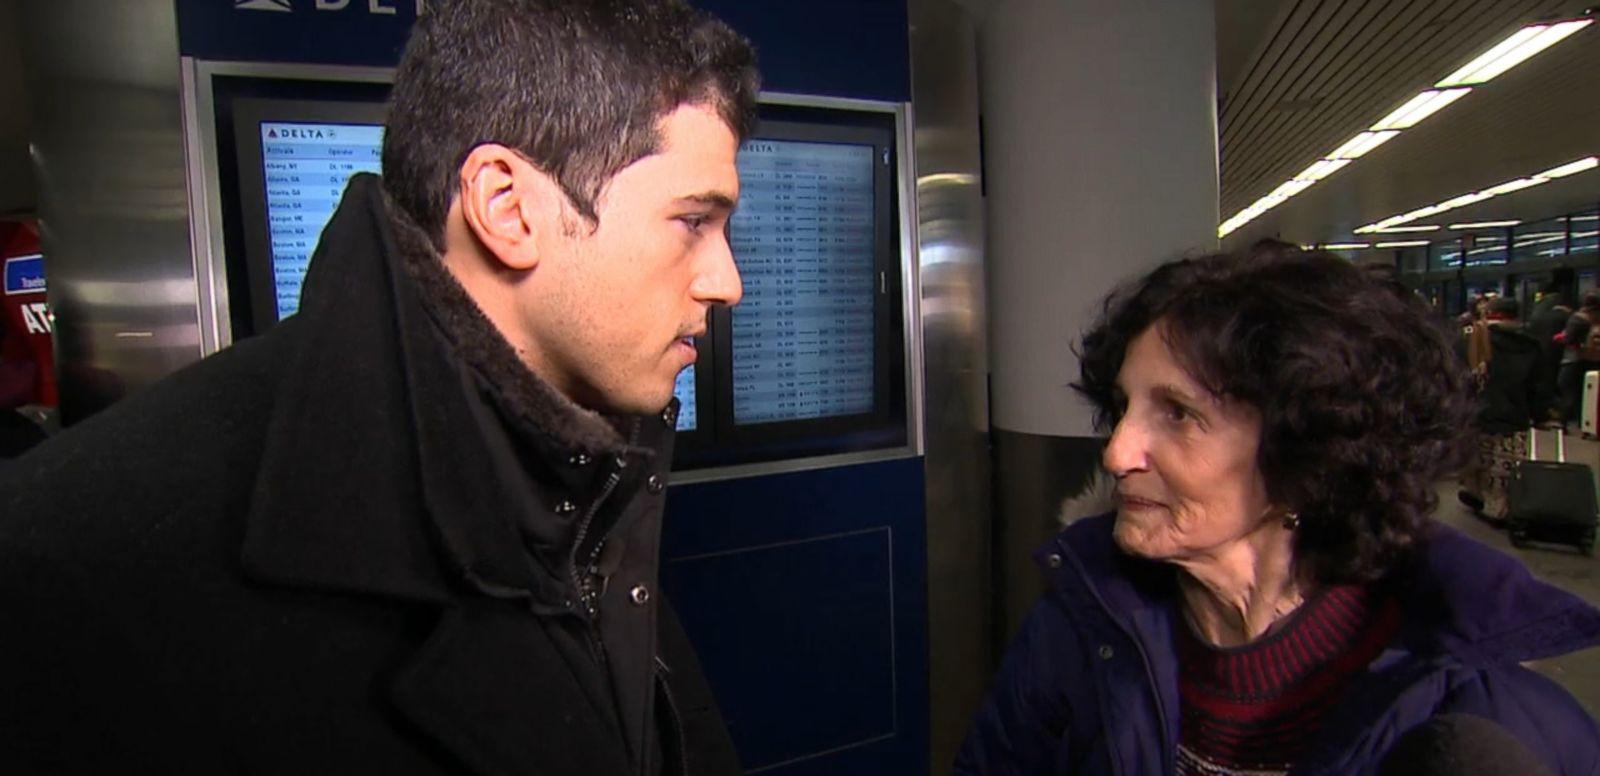 VIDEO: Sheila Mihalovits, 73, describes the landing mishap of Delta Flight 1086 at LaGuardia Airport.